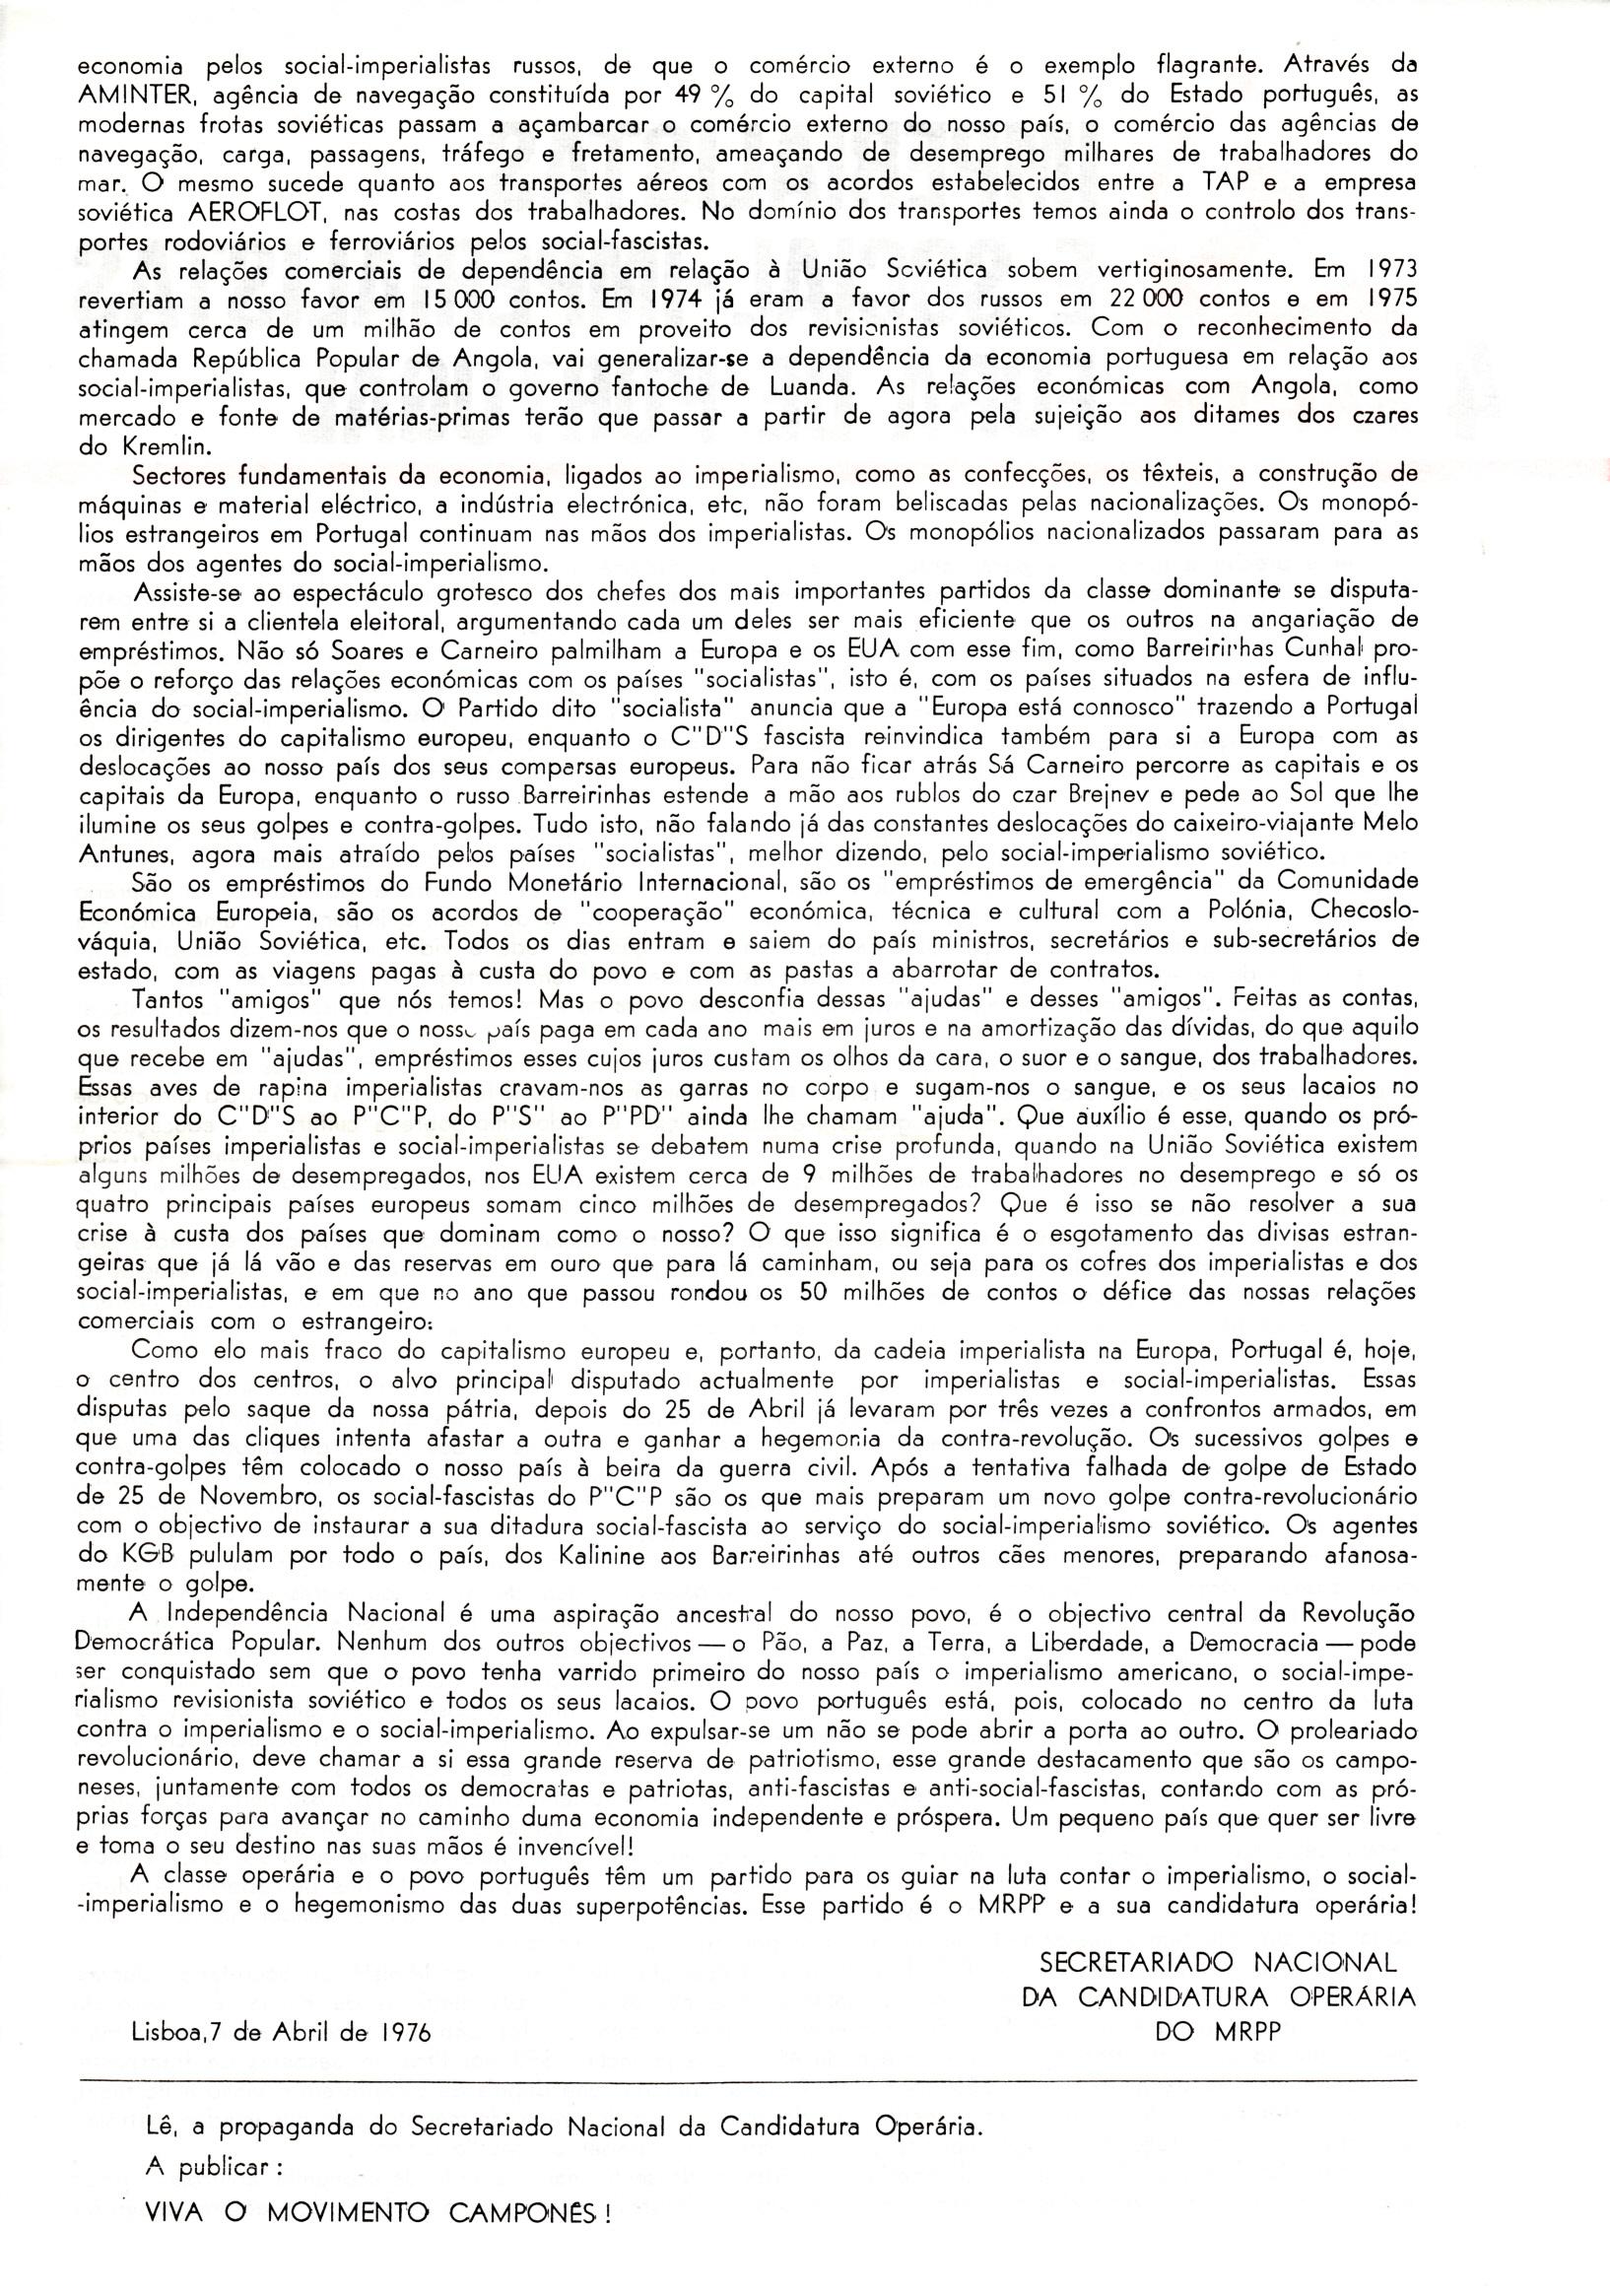 mrpp_1976_eleicao_programa_0008